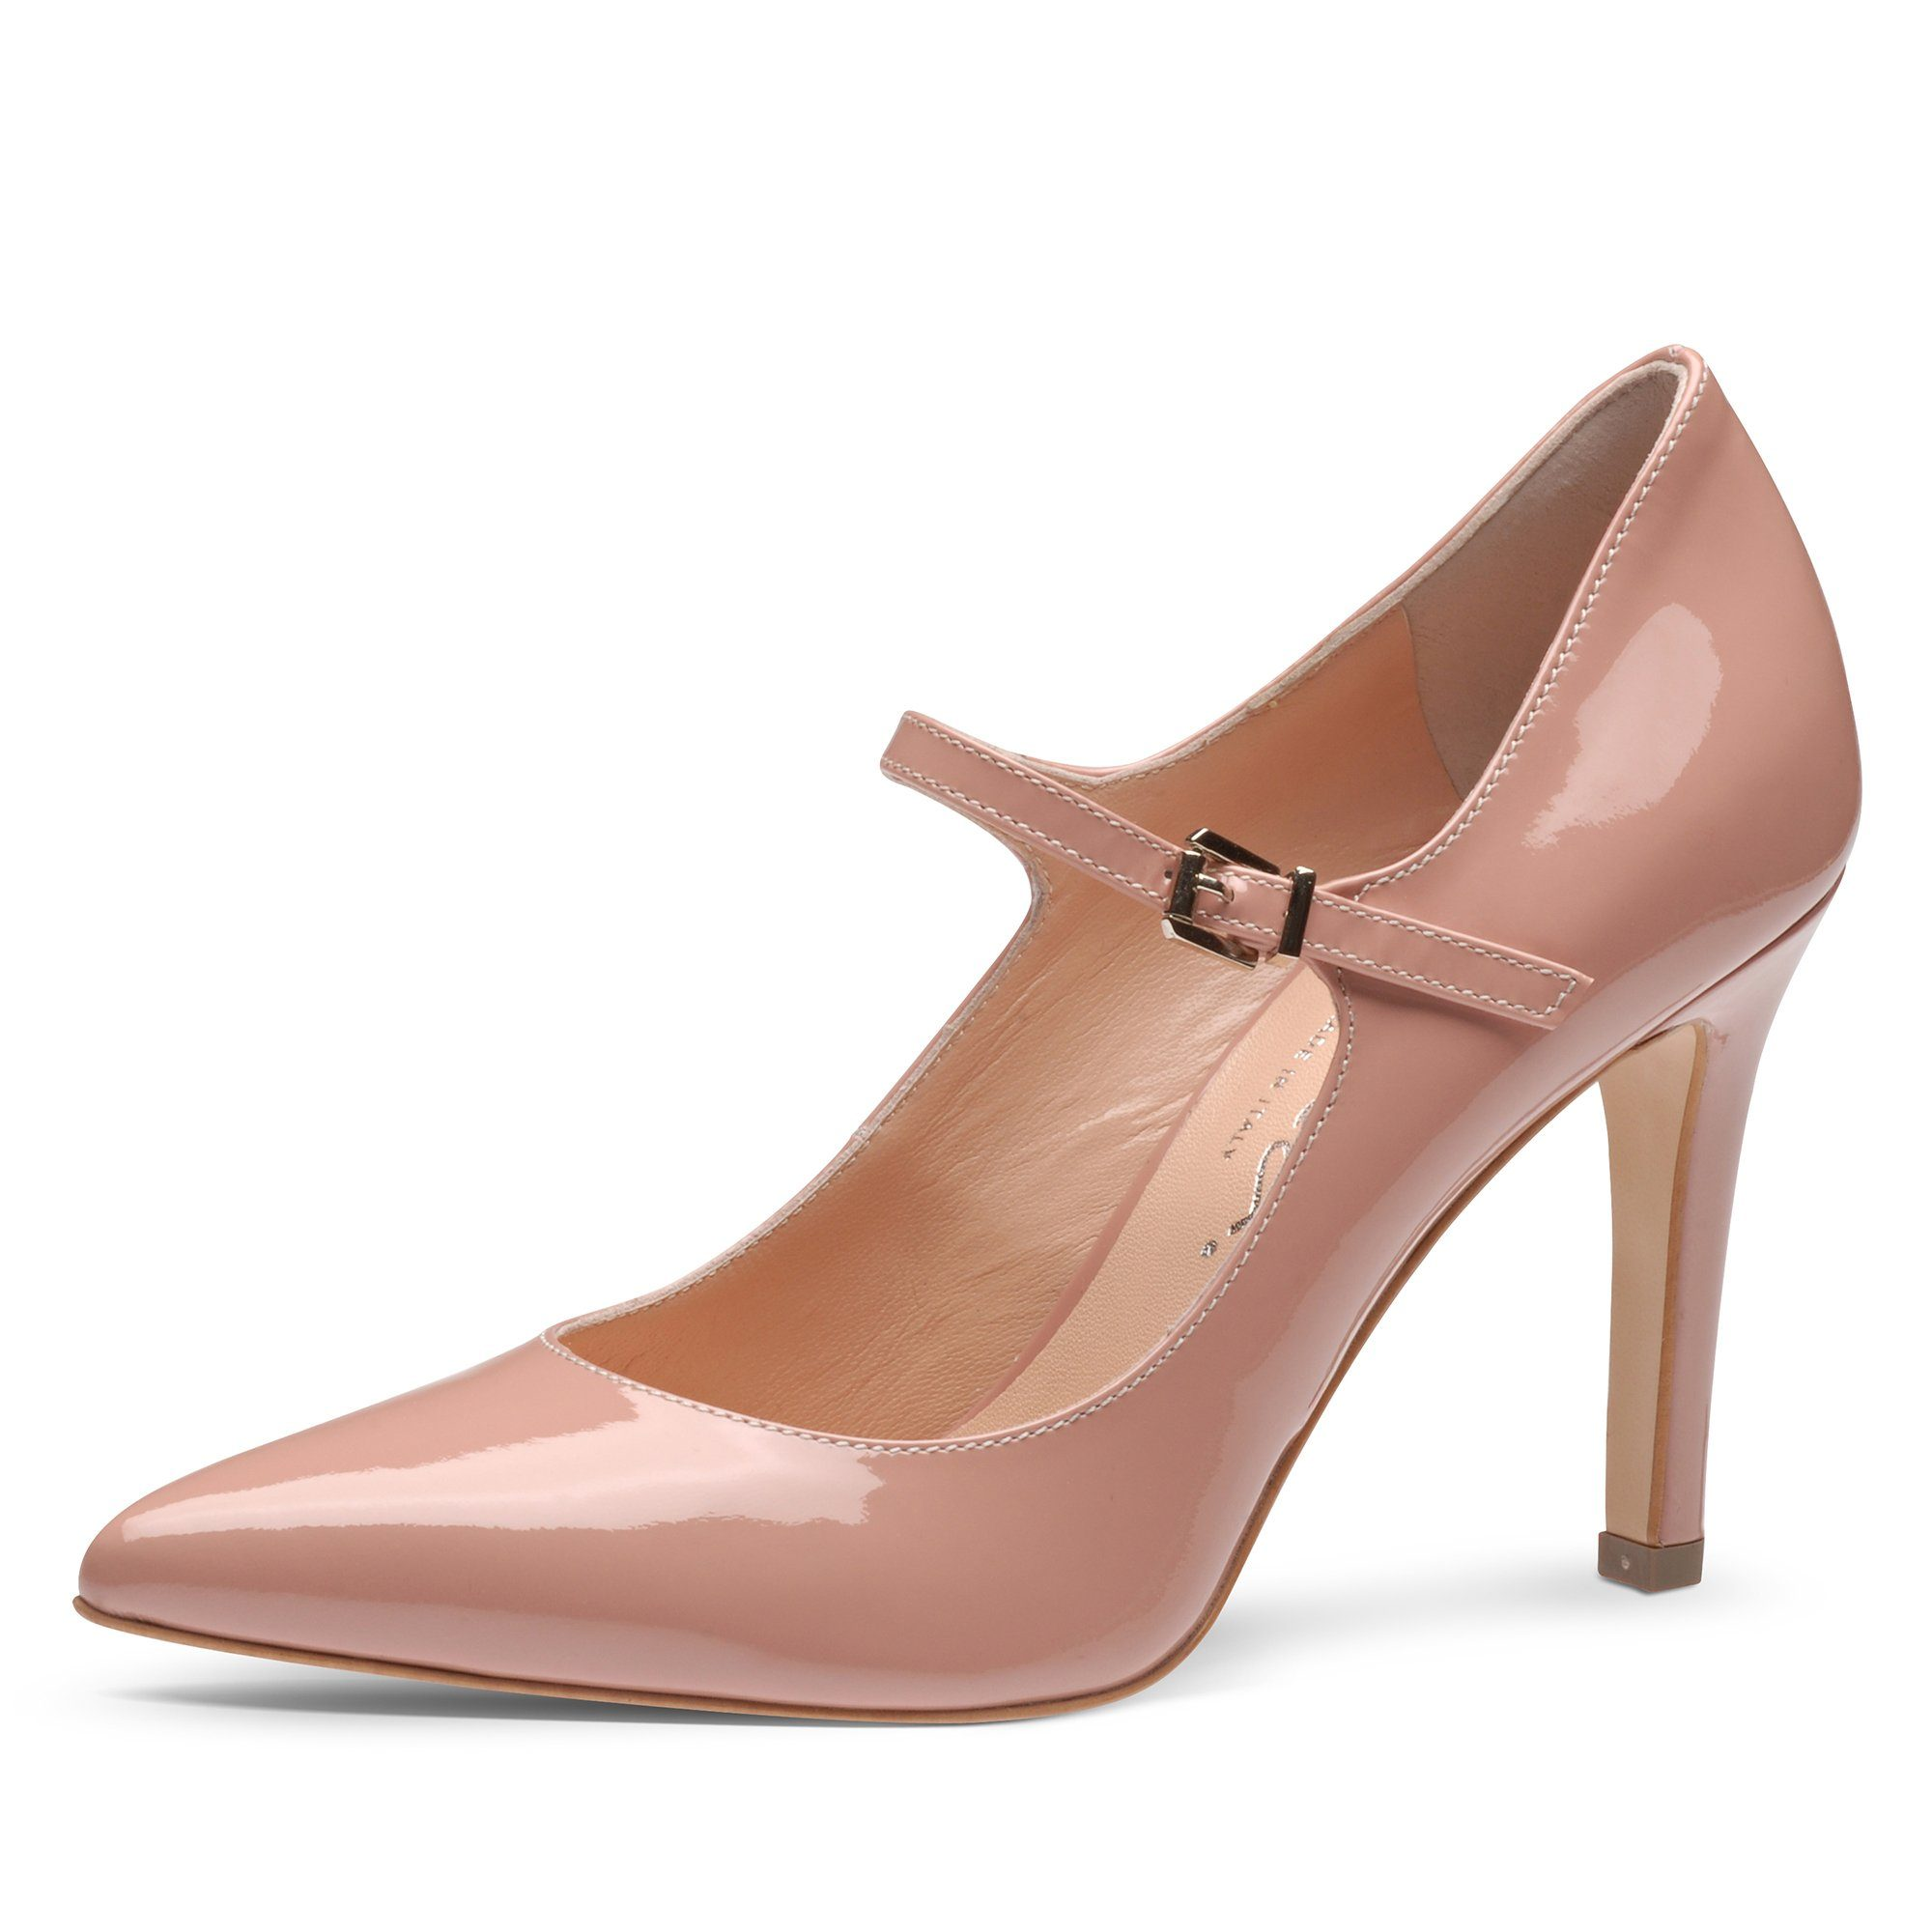 Evita ILARIA Pumps online kaufen  rosa